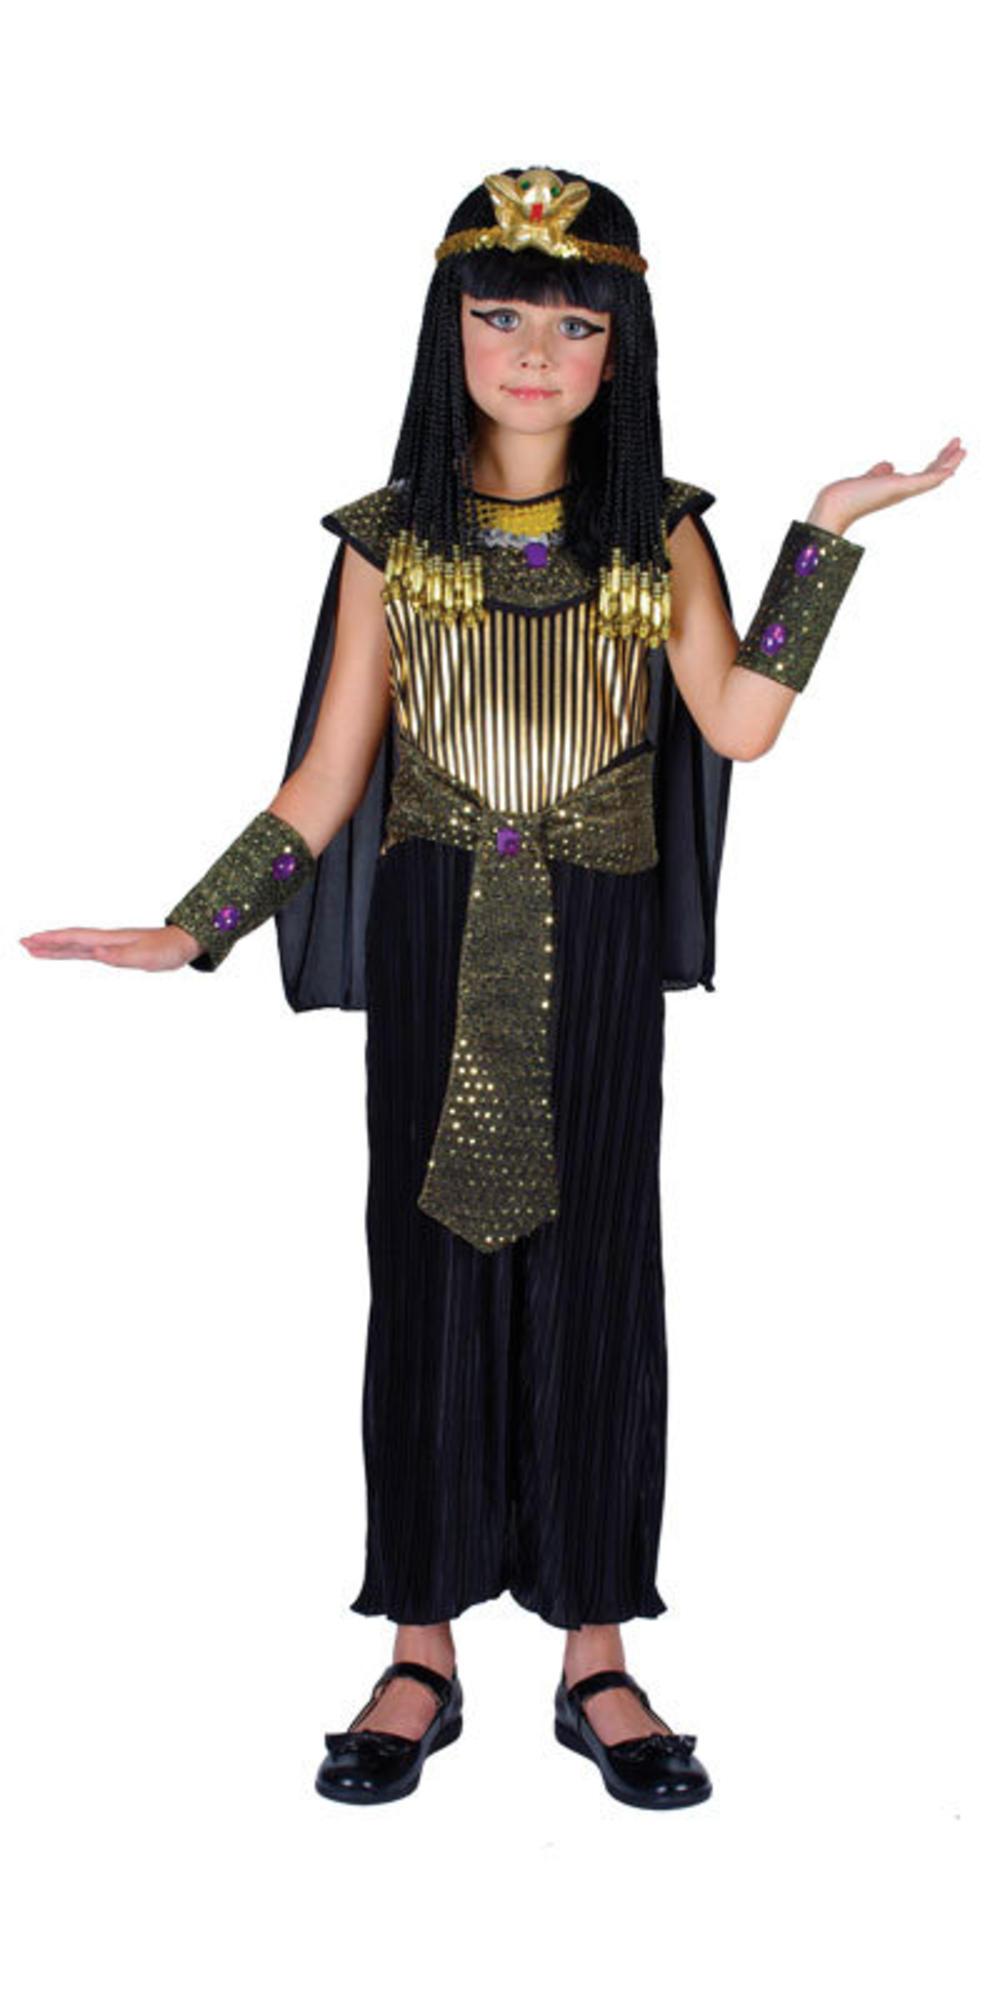 Queen Cleopatra Dress + Headpiece Girls Fancy Dress Egyptian Kids Costume Outfit